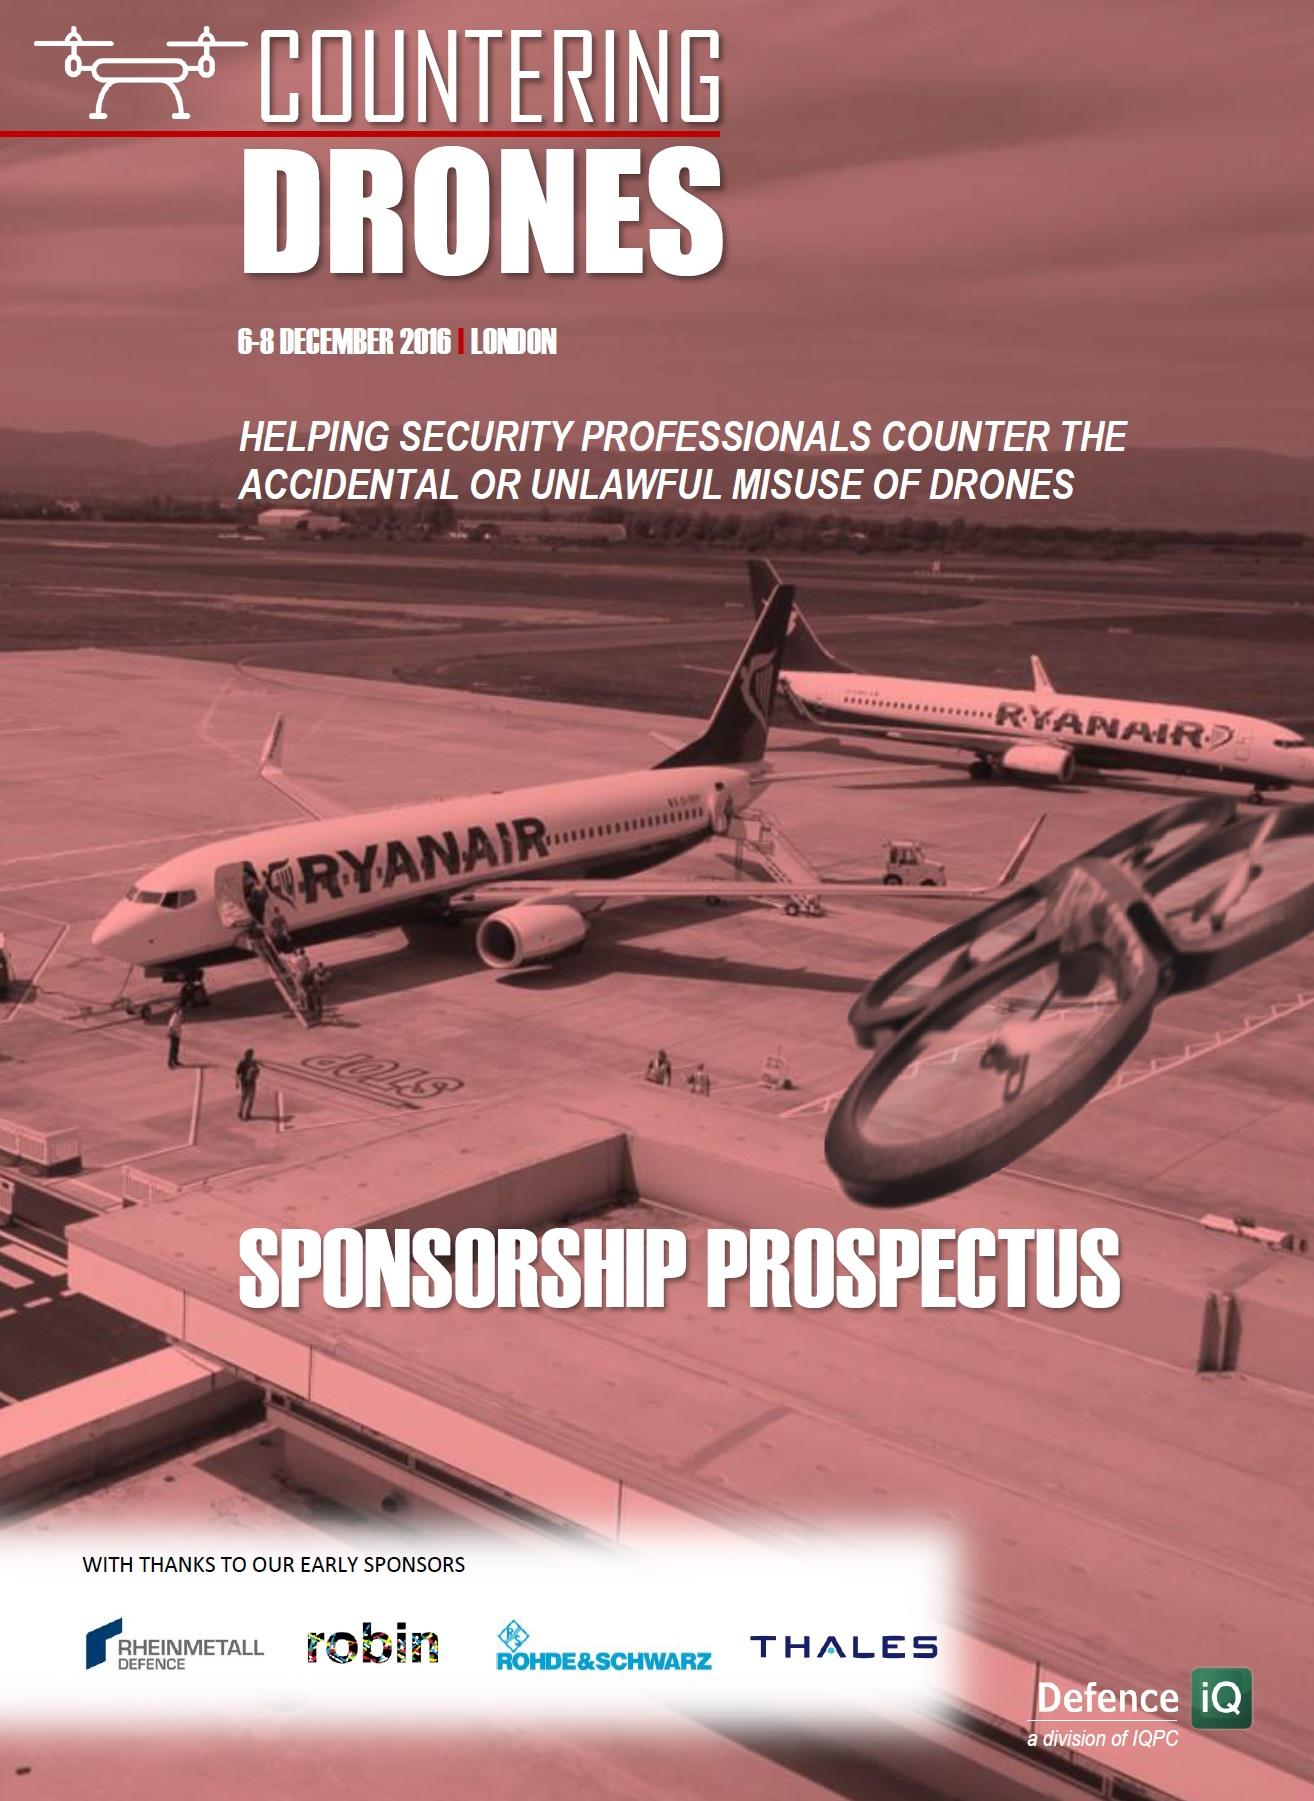 Countering Drones Sponsorship Prospectus